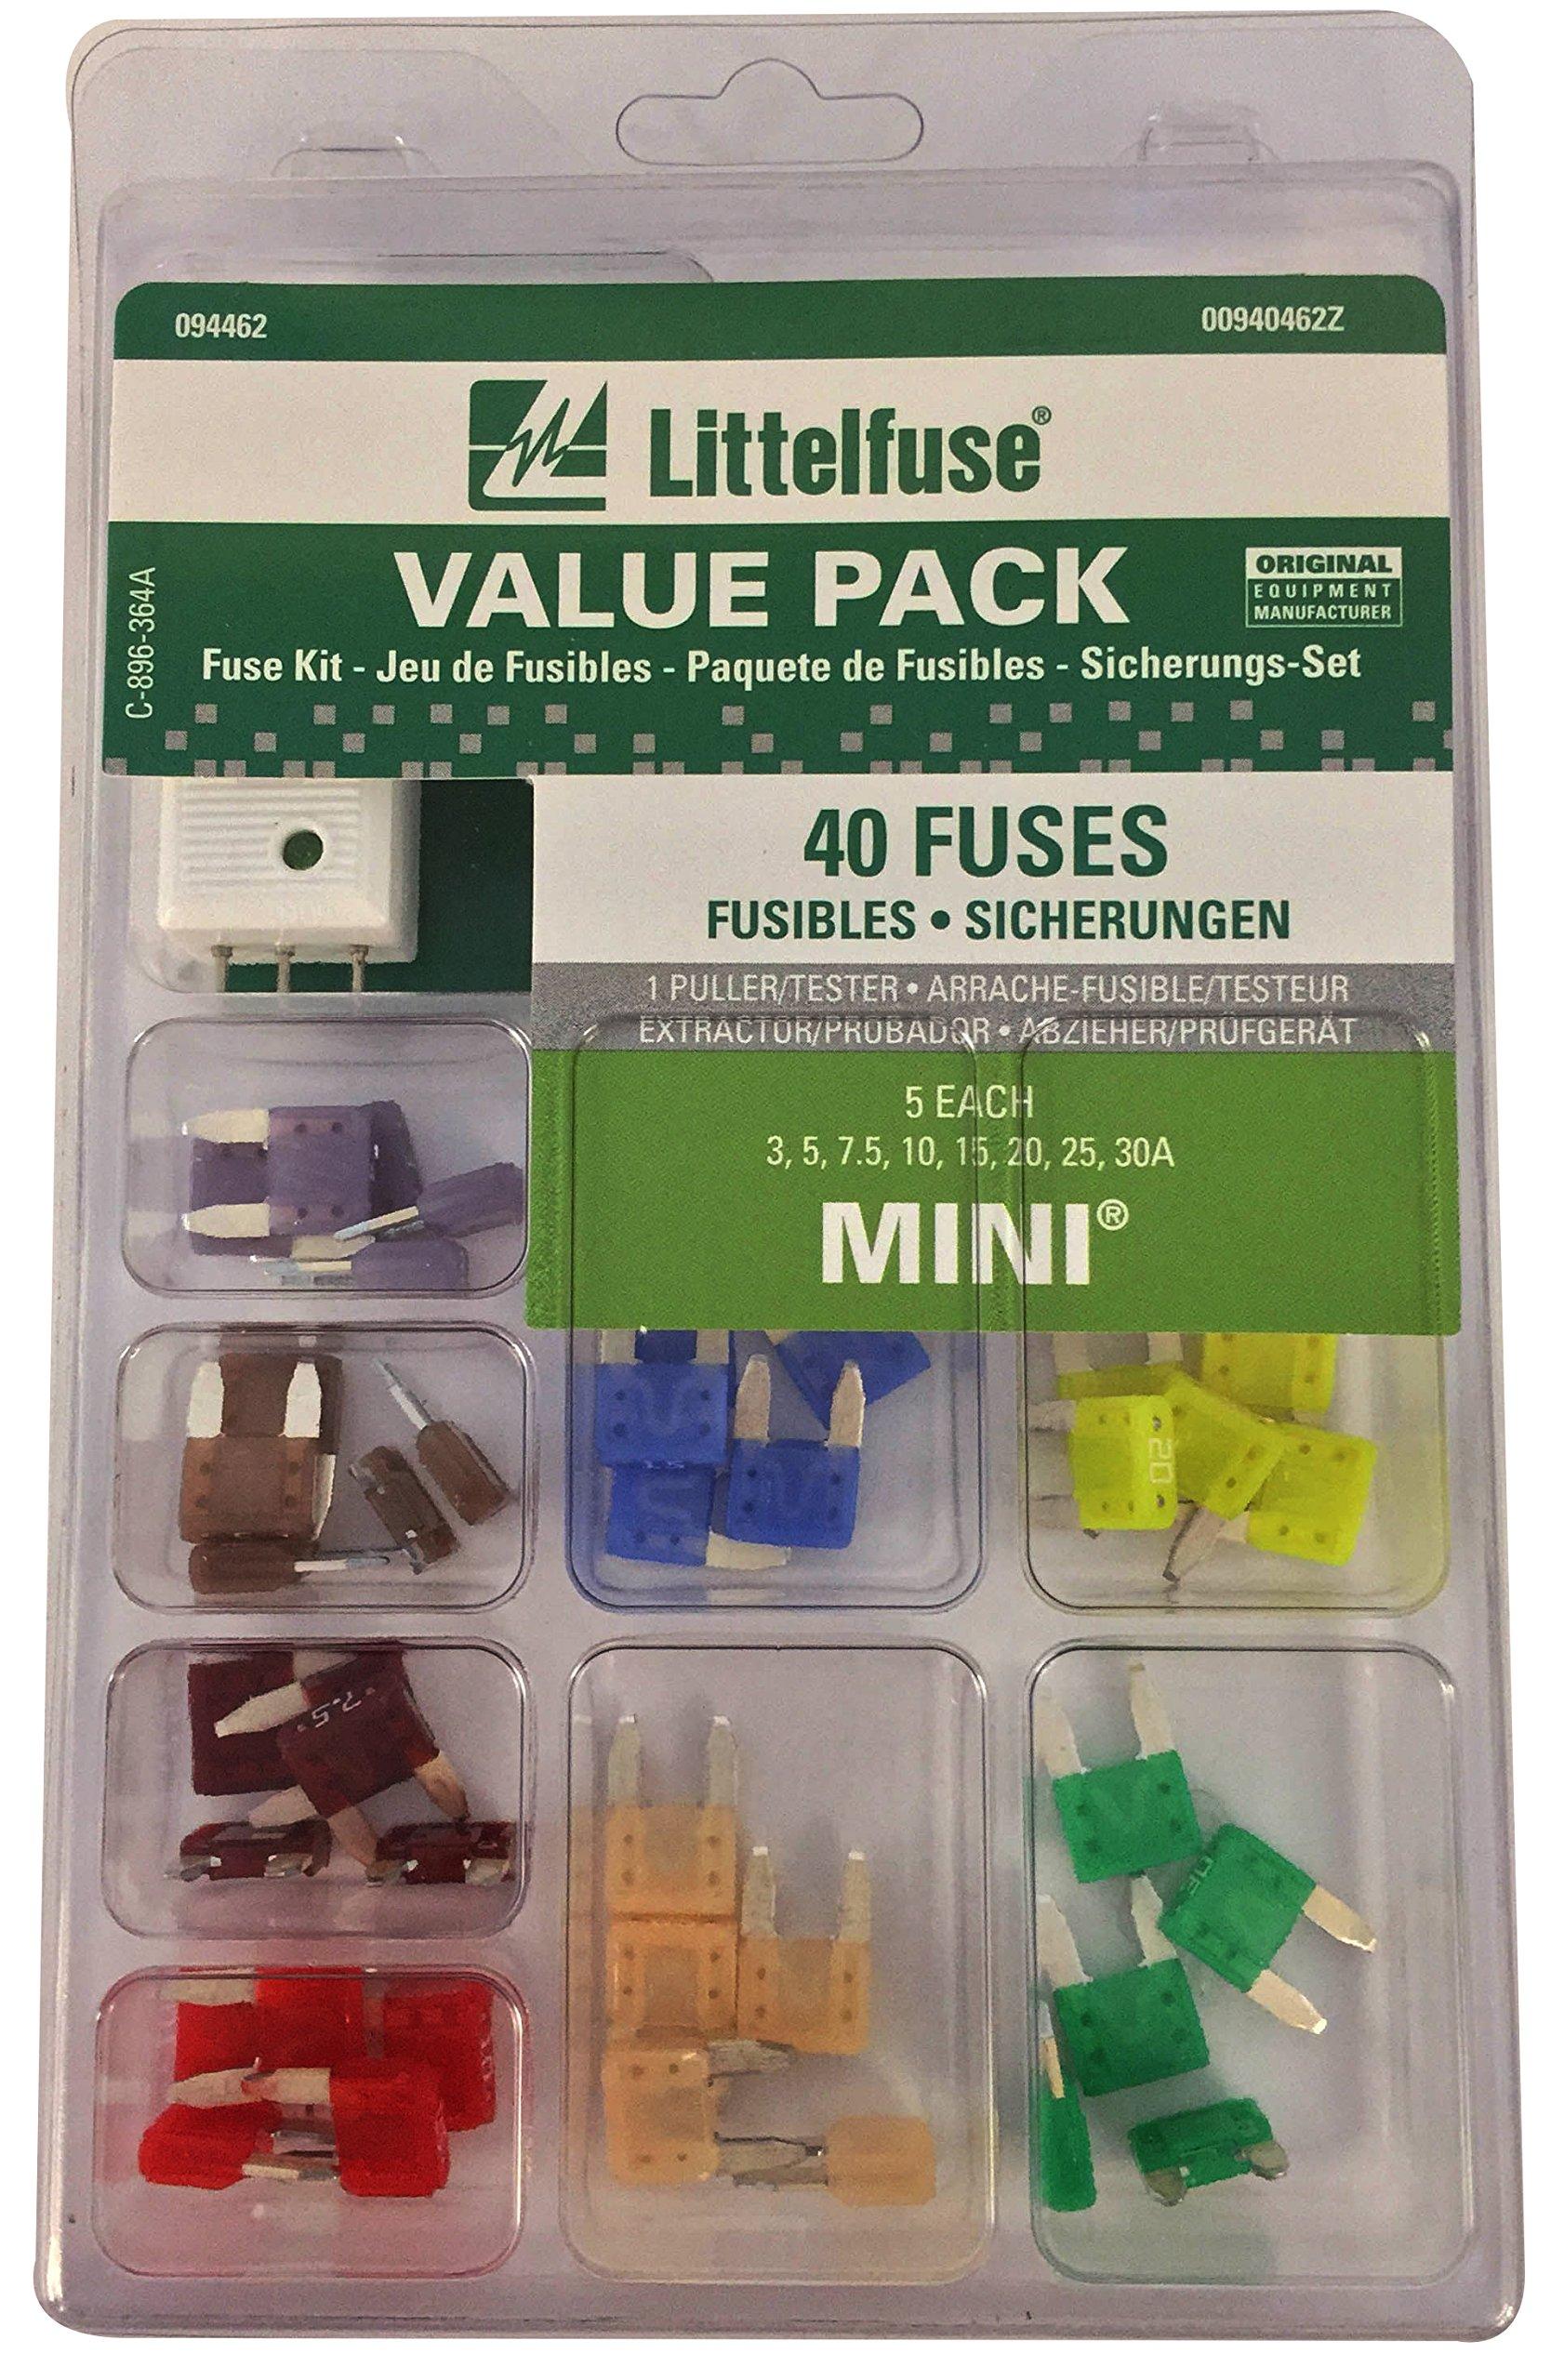 Littelfuse 00940462Z Mini Fuse Assortment - 40 Piece